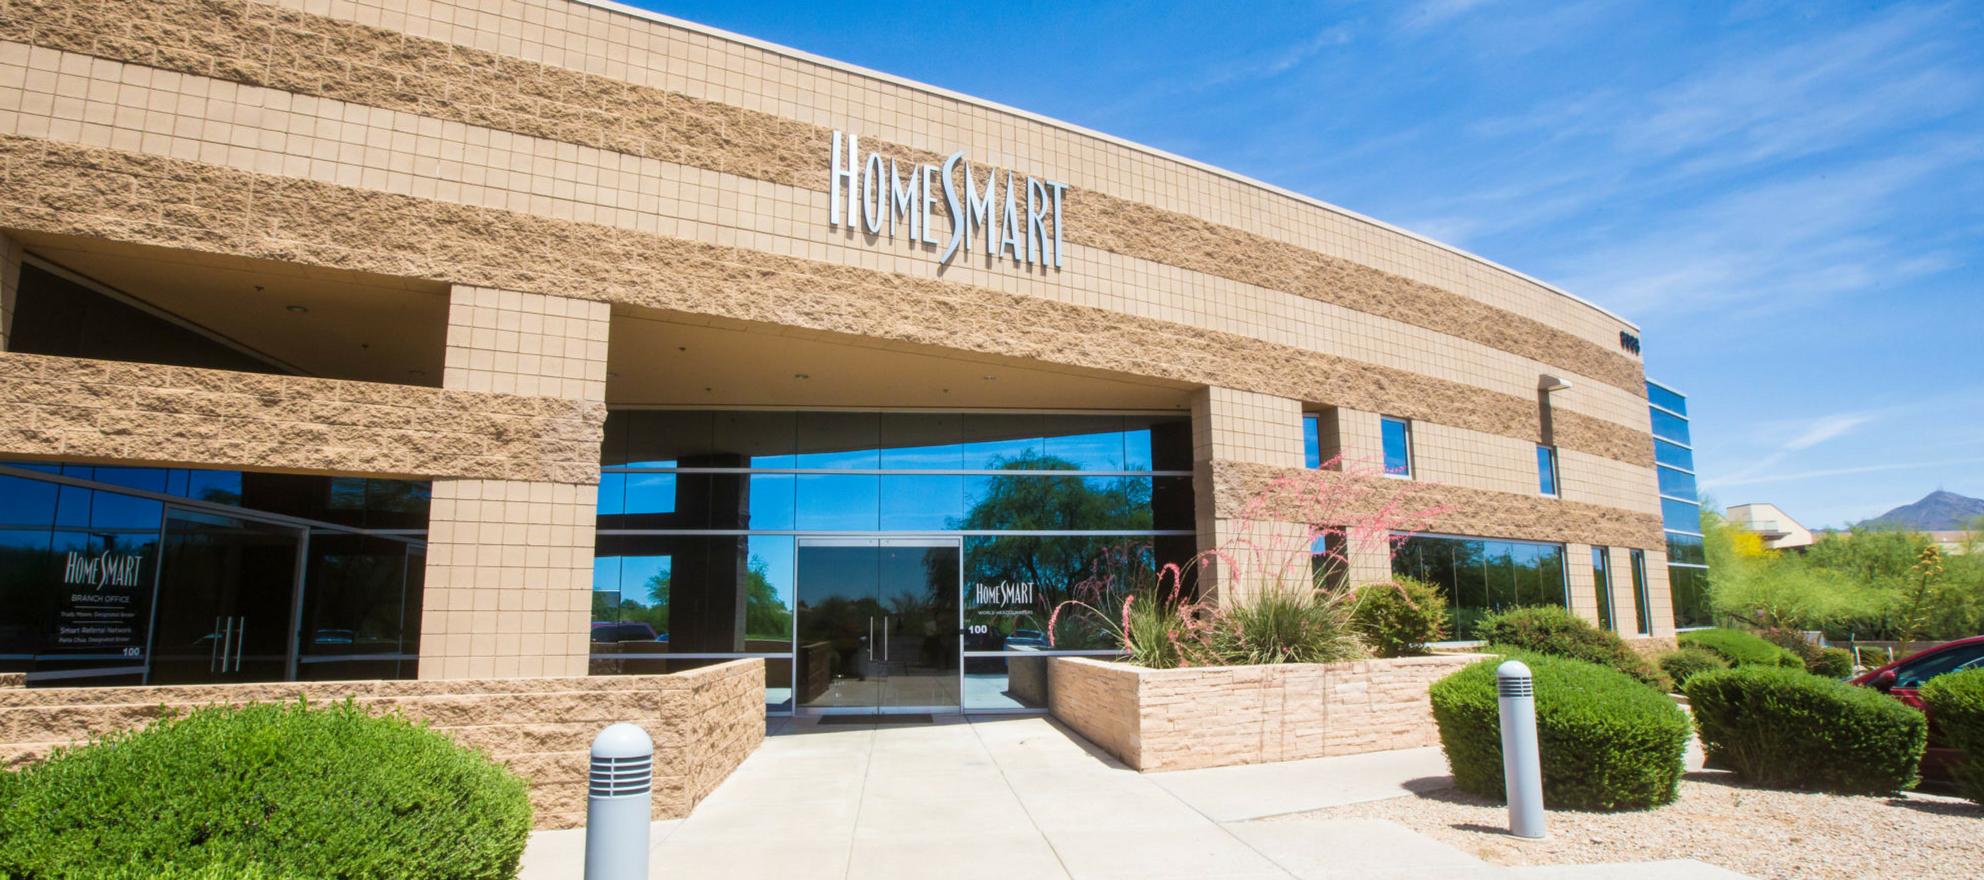 homesmart health insurance